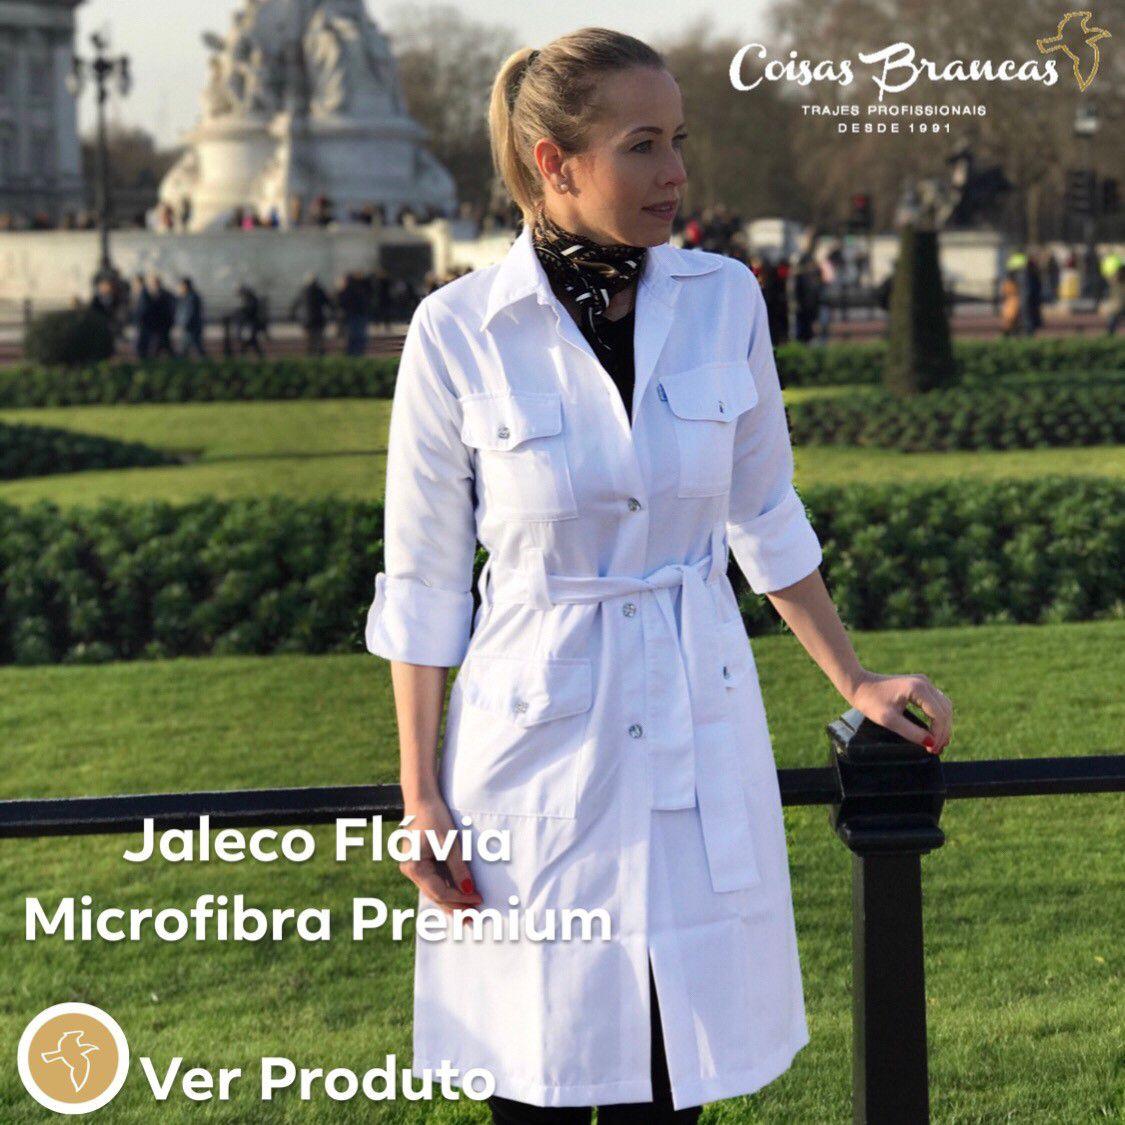 Jaleco Flávia Feminino  Swarovski  Manga ¾ Microfibra PREMIUM detalhes Cetim